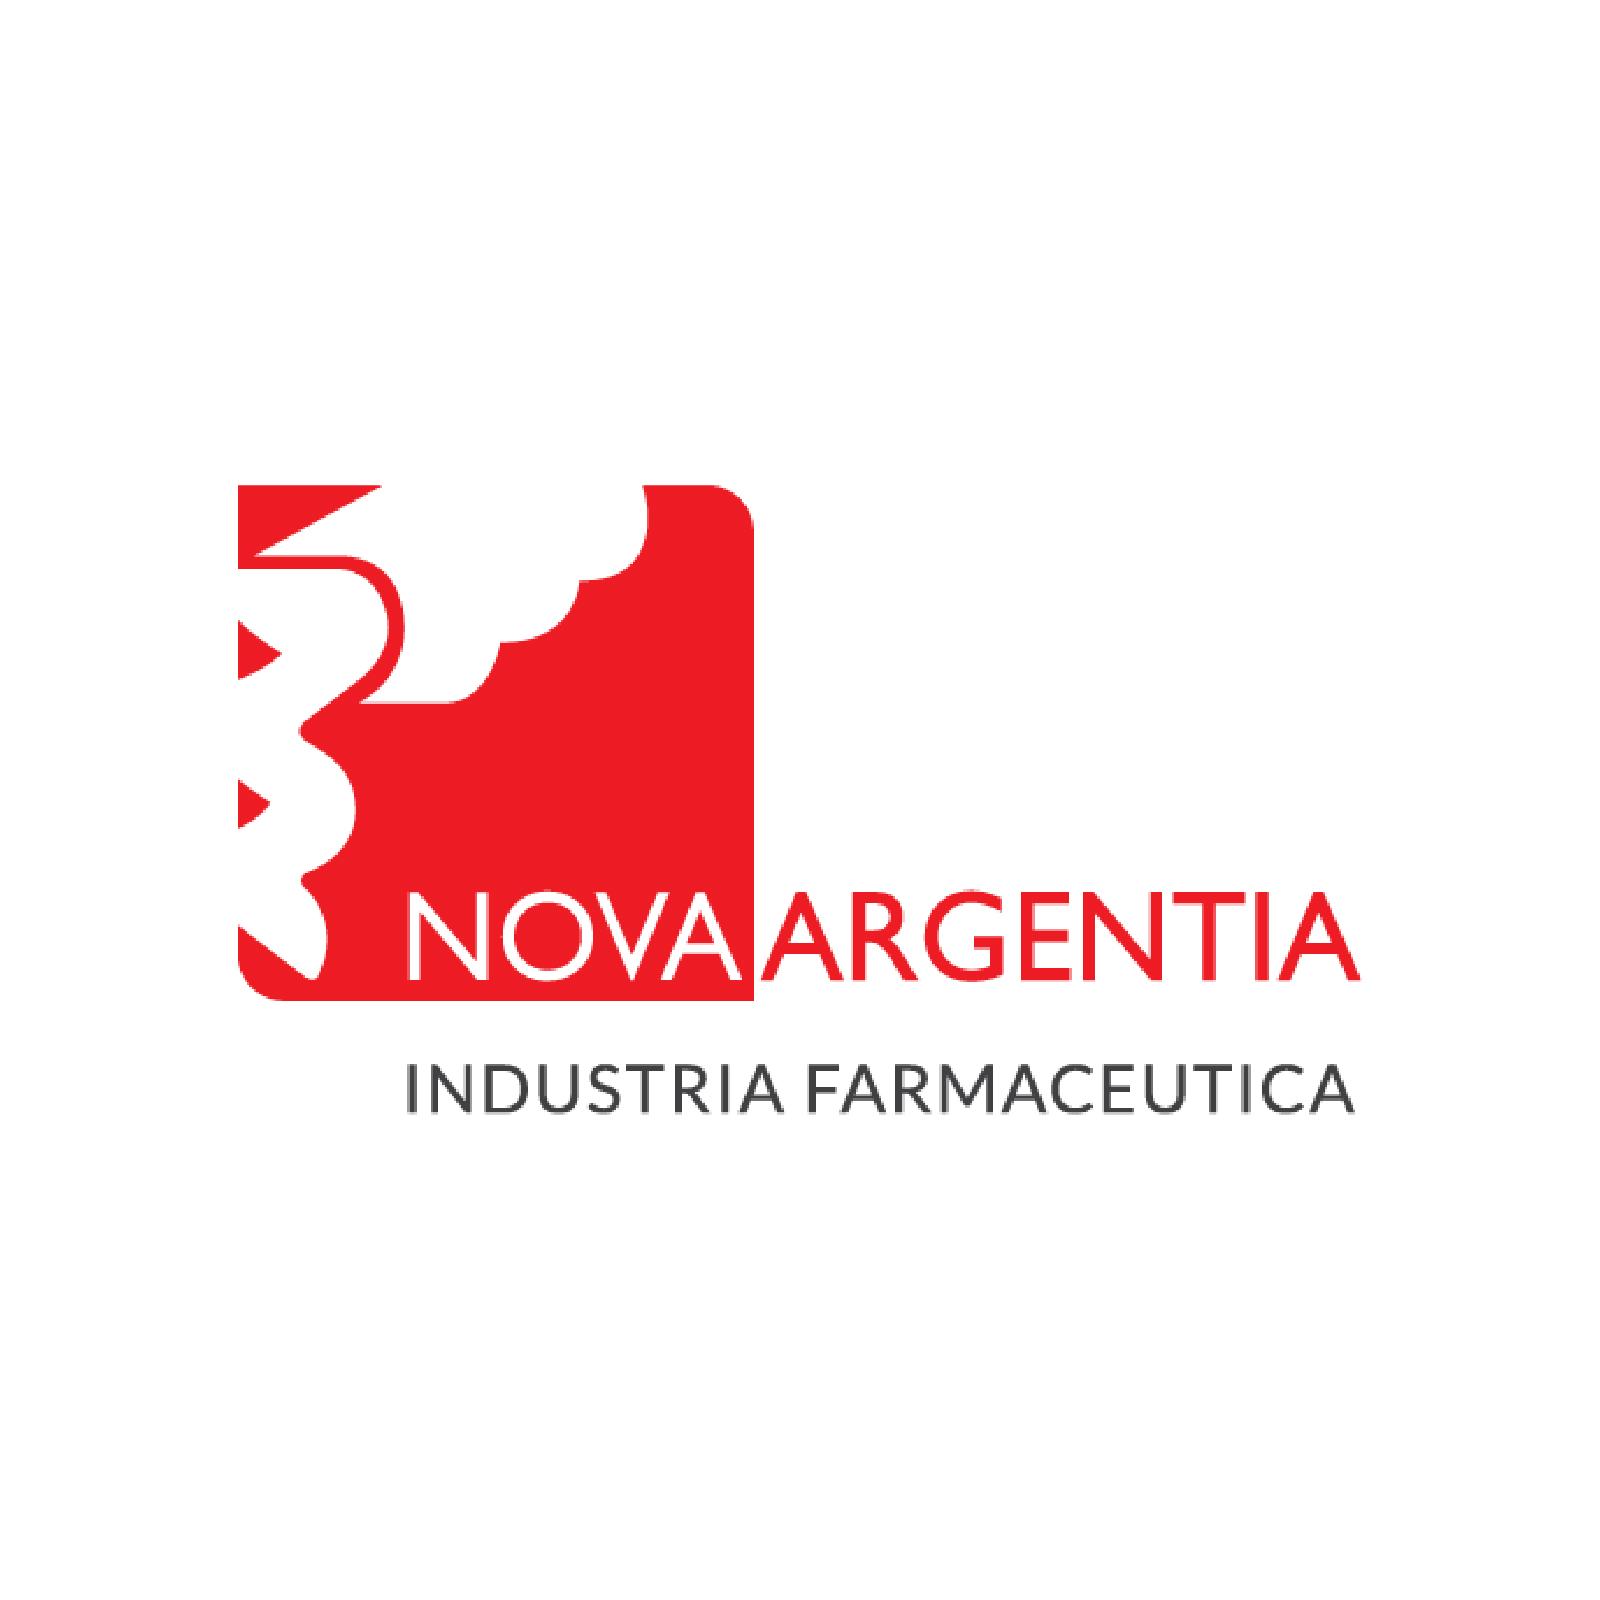 Nova ARgentia